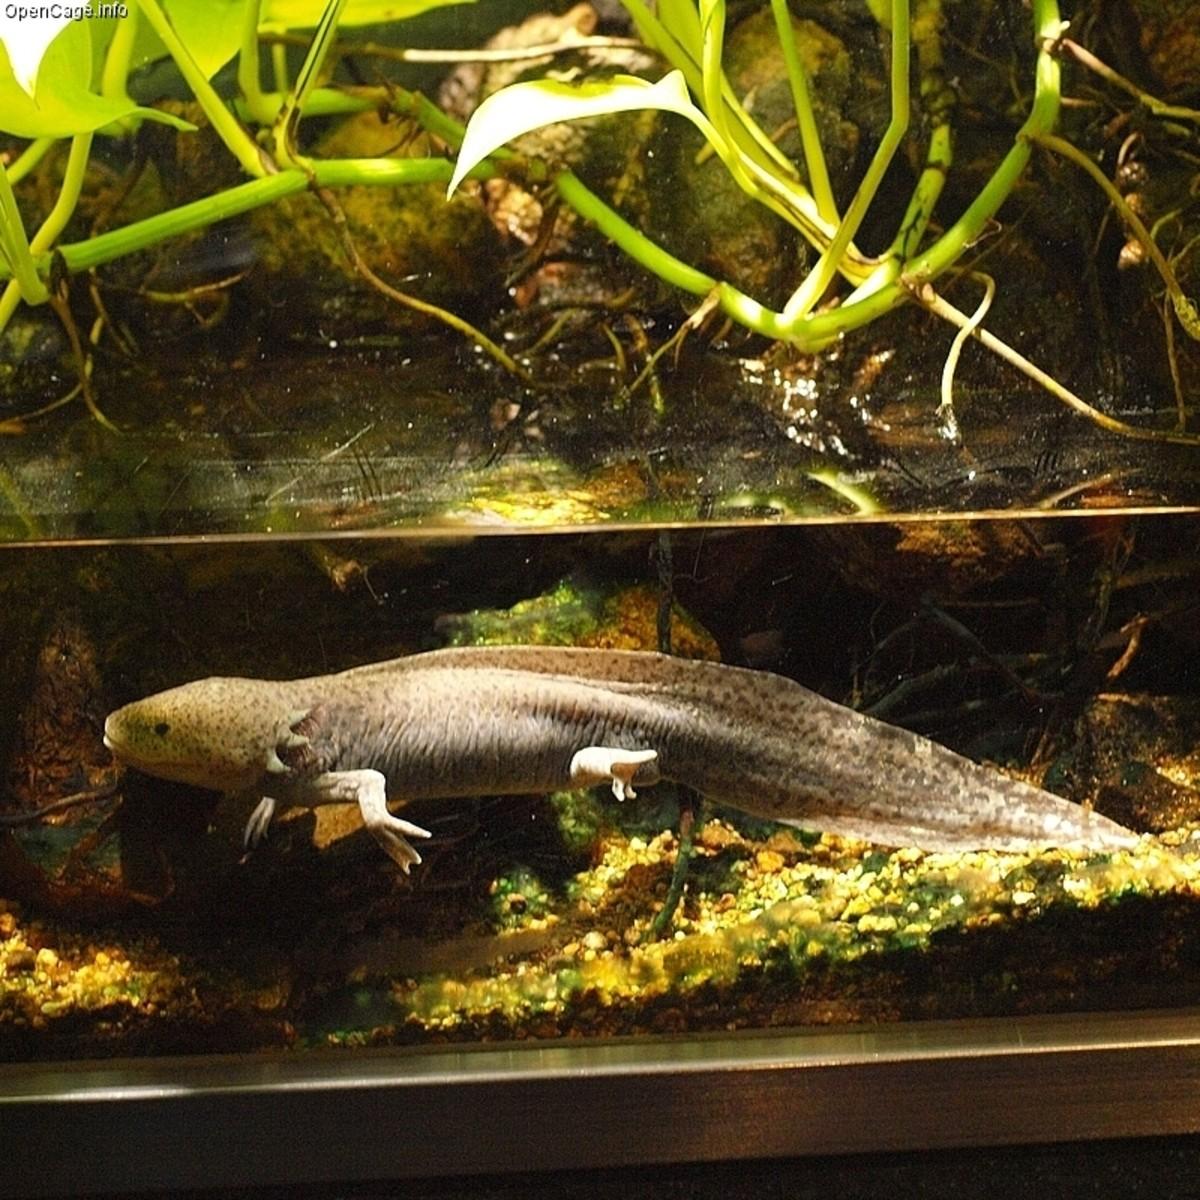 Unique and Easy Pet - Mexican Walking Fish, The Axolotl